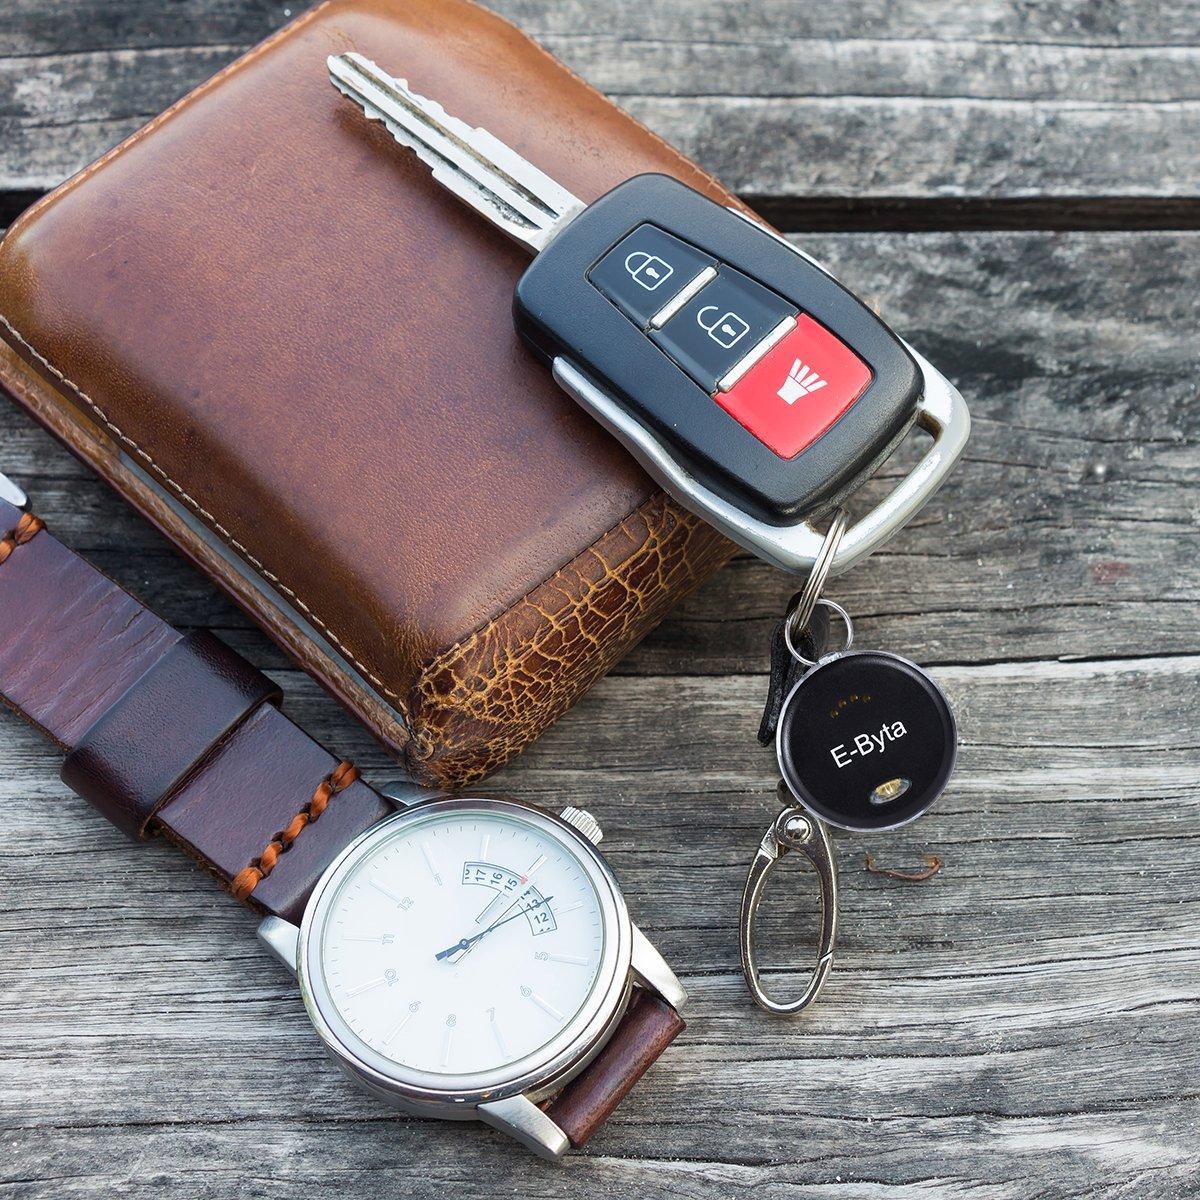 E-Byta 2PCS-Bluetooth key finder,bluetooth tracking devic,phone tracking device,bluetooth finder,phone/ Wallet/or key finder by E-Byta (Image #3)